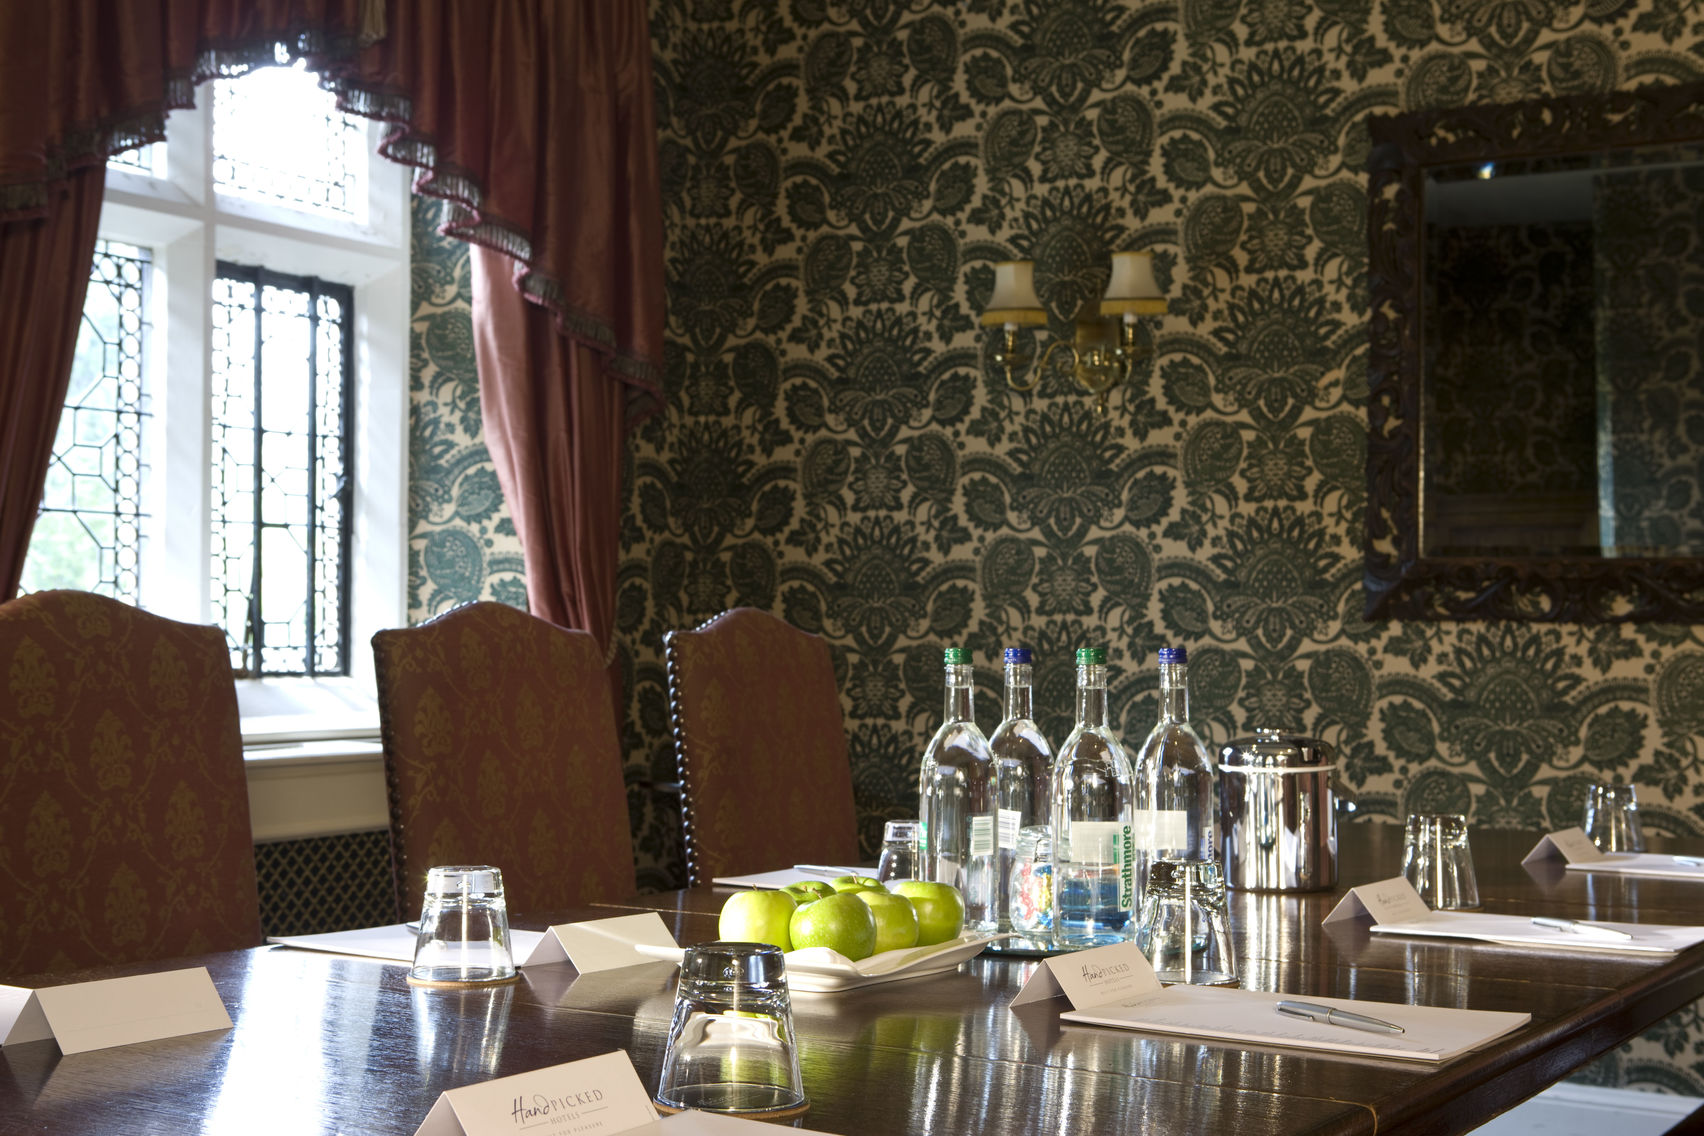 Book Garden Room, New Hall Hotel & Spa (Sutton Coldfield) – HeadBox